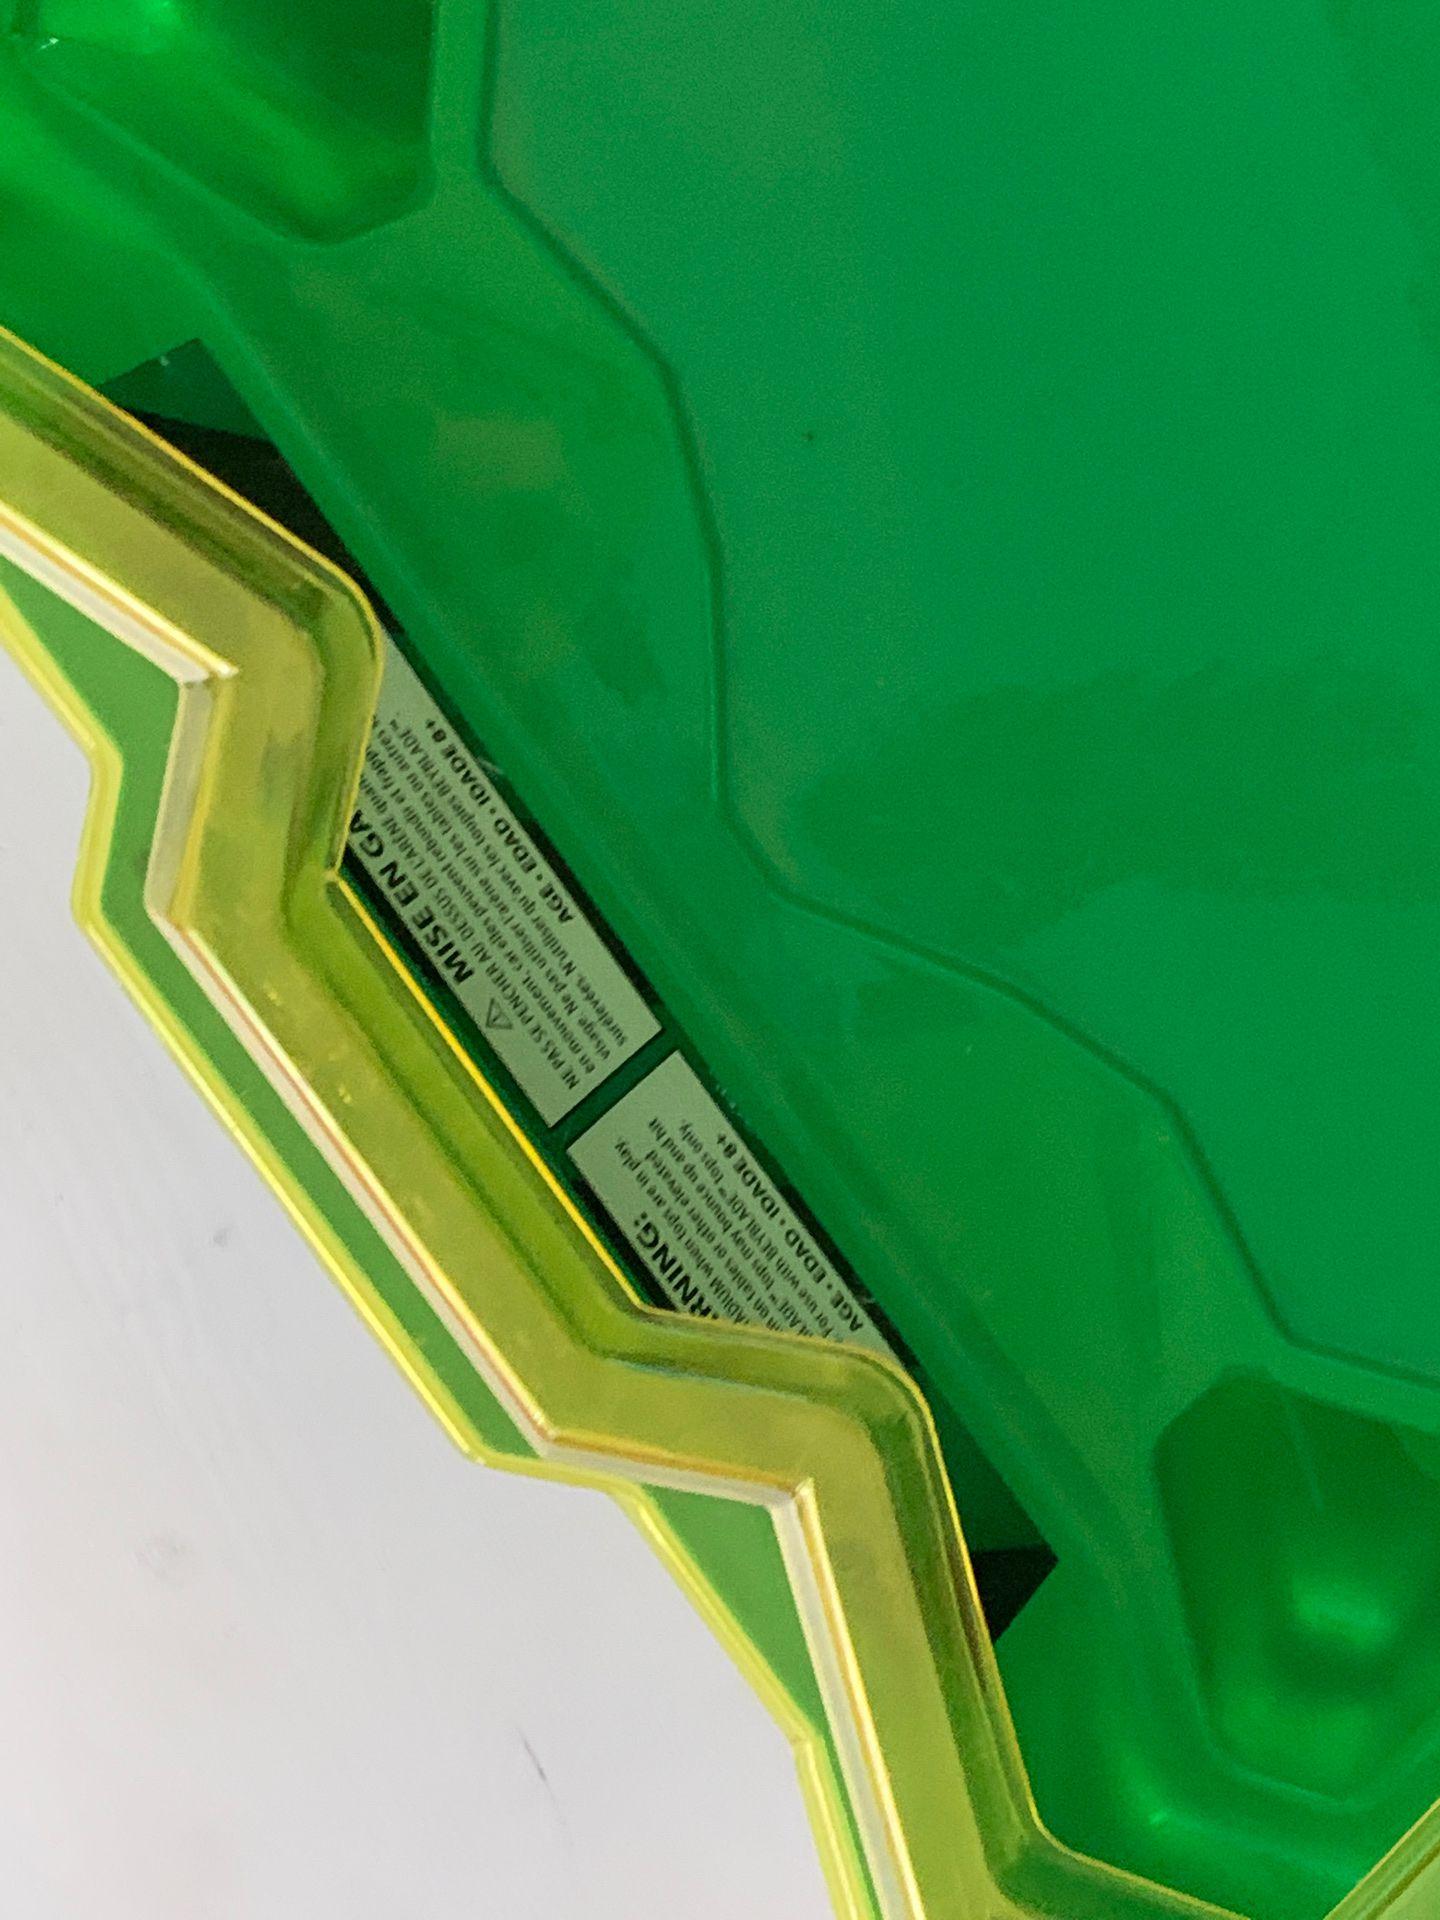 Green bayblade stadium